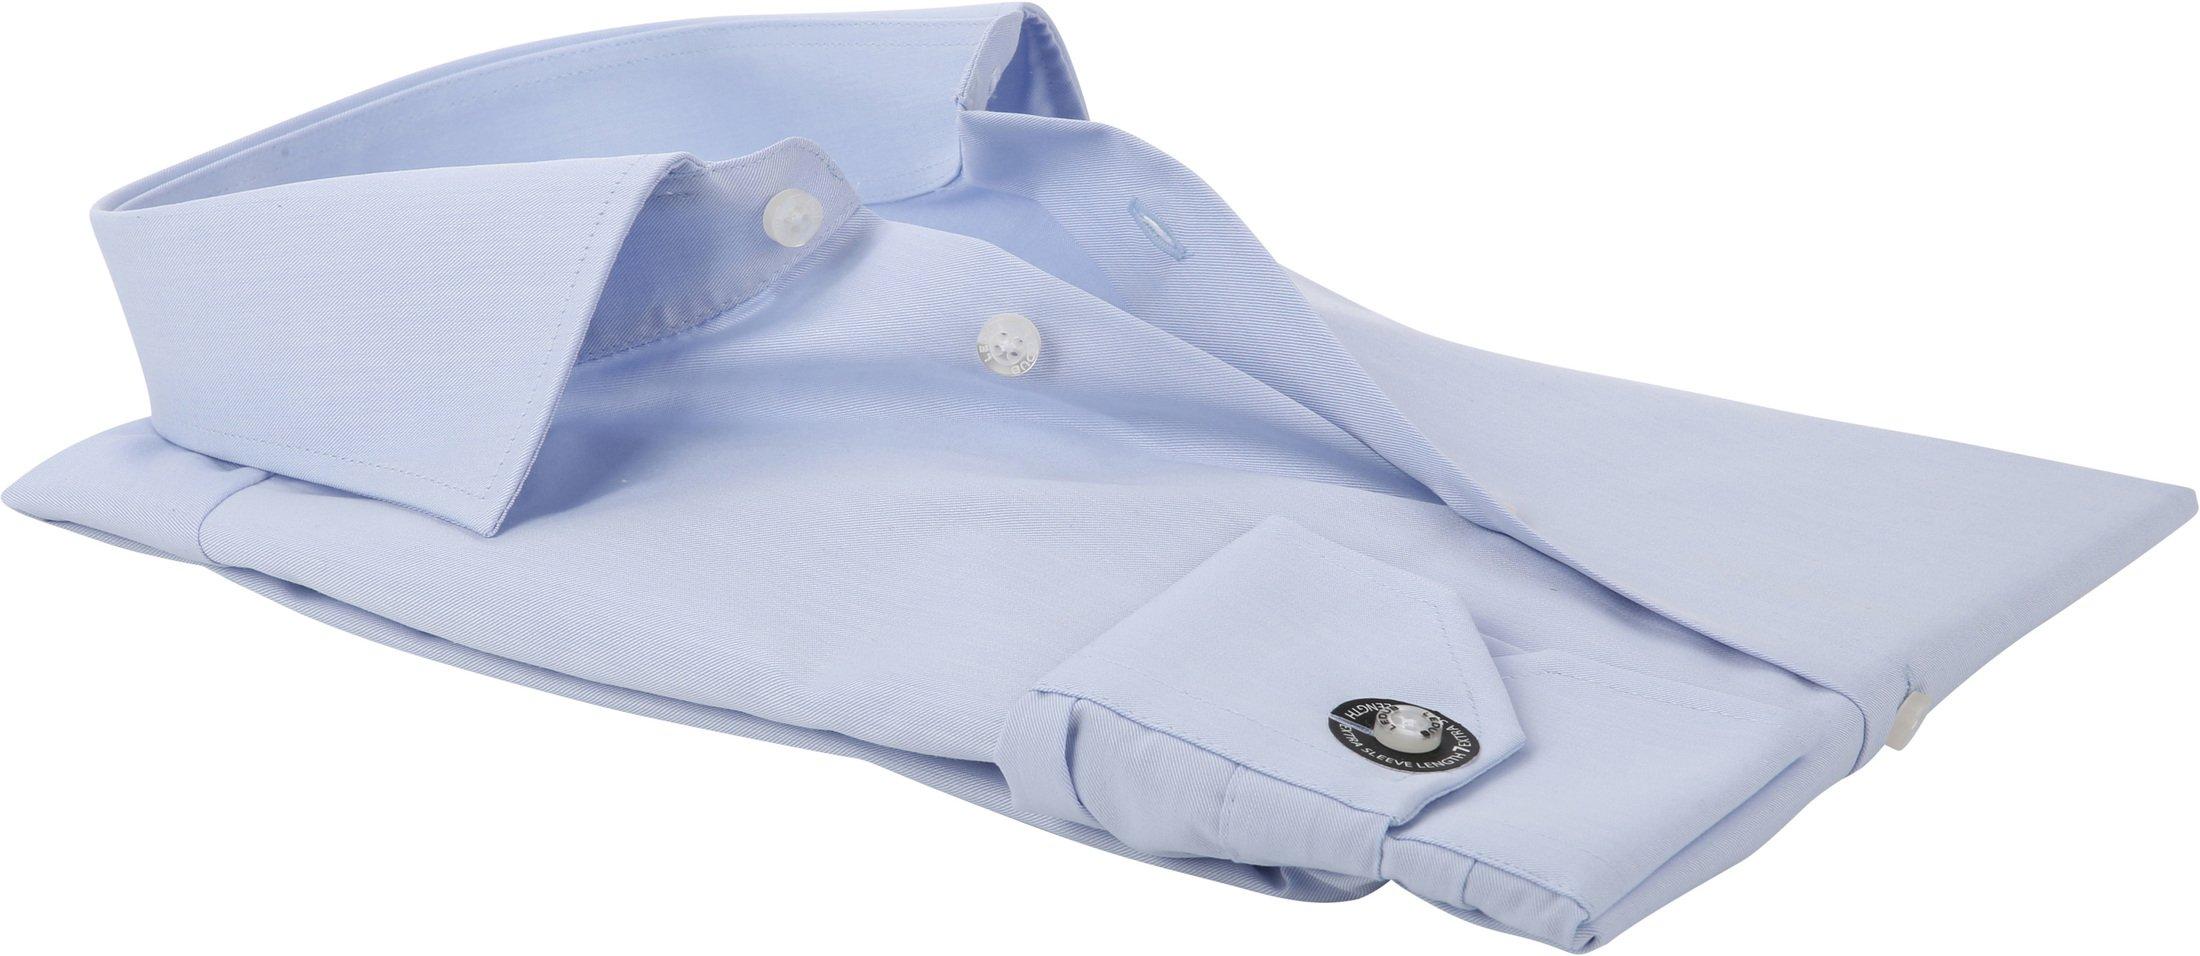 Ledub Strijkvrij Overhemd Blauw Sleeve 7 foto 3